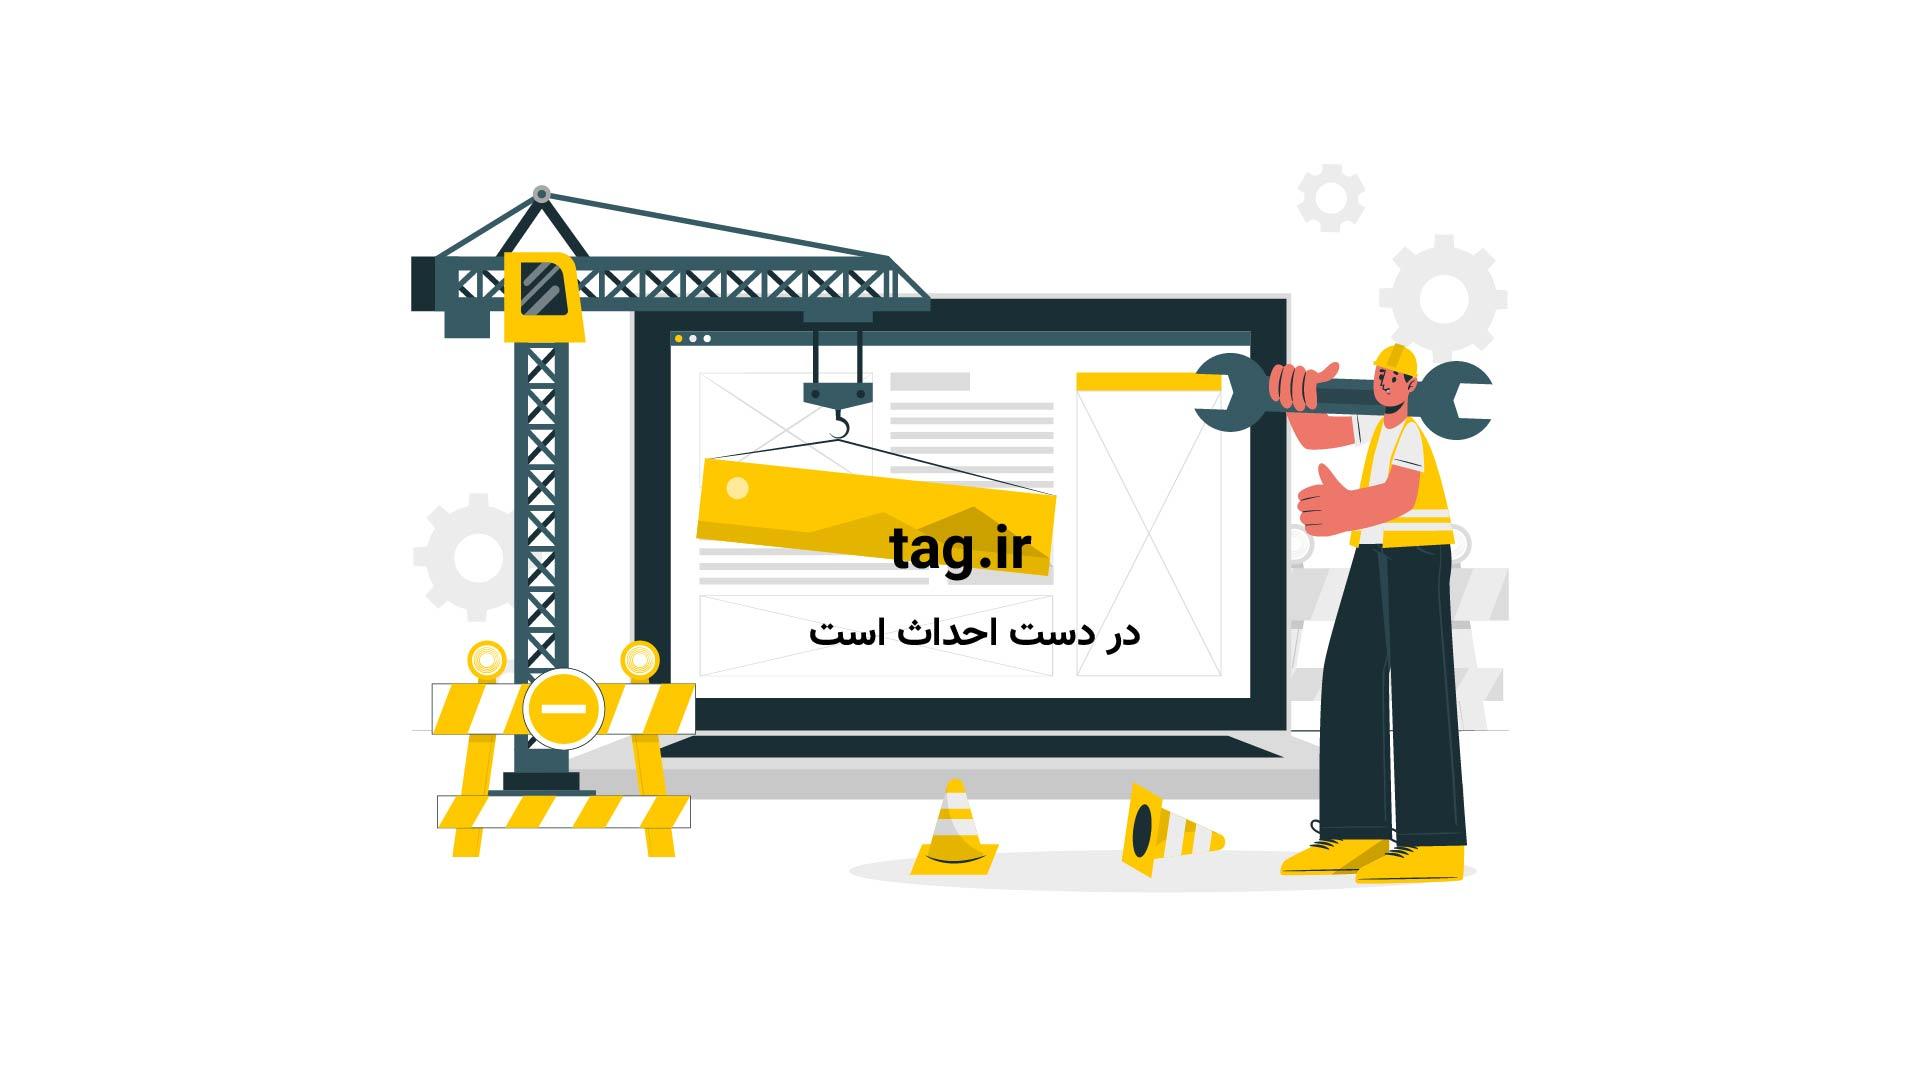 مسی، مارادونا و رونالدو برزیلی | تگ